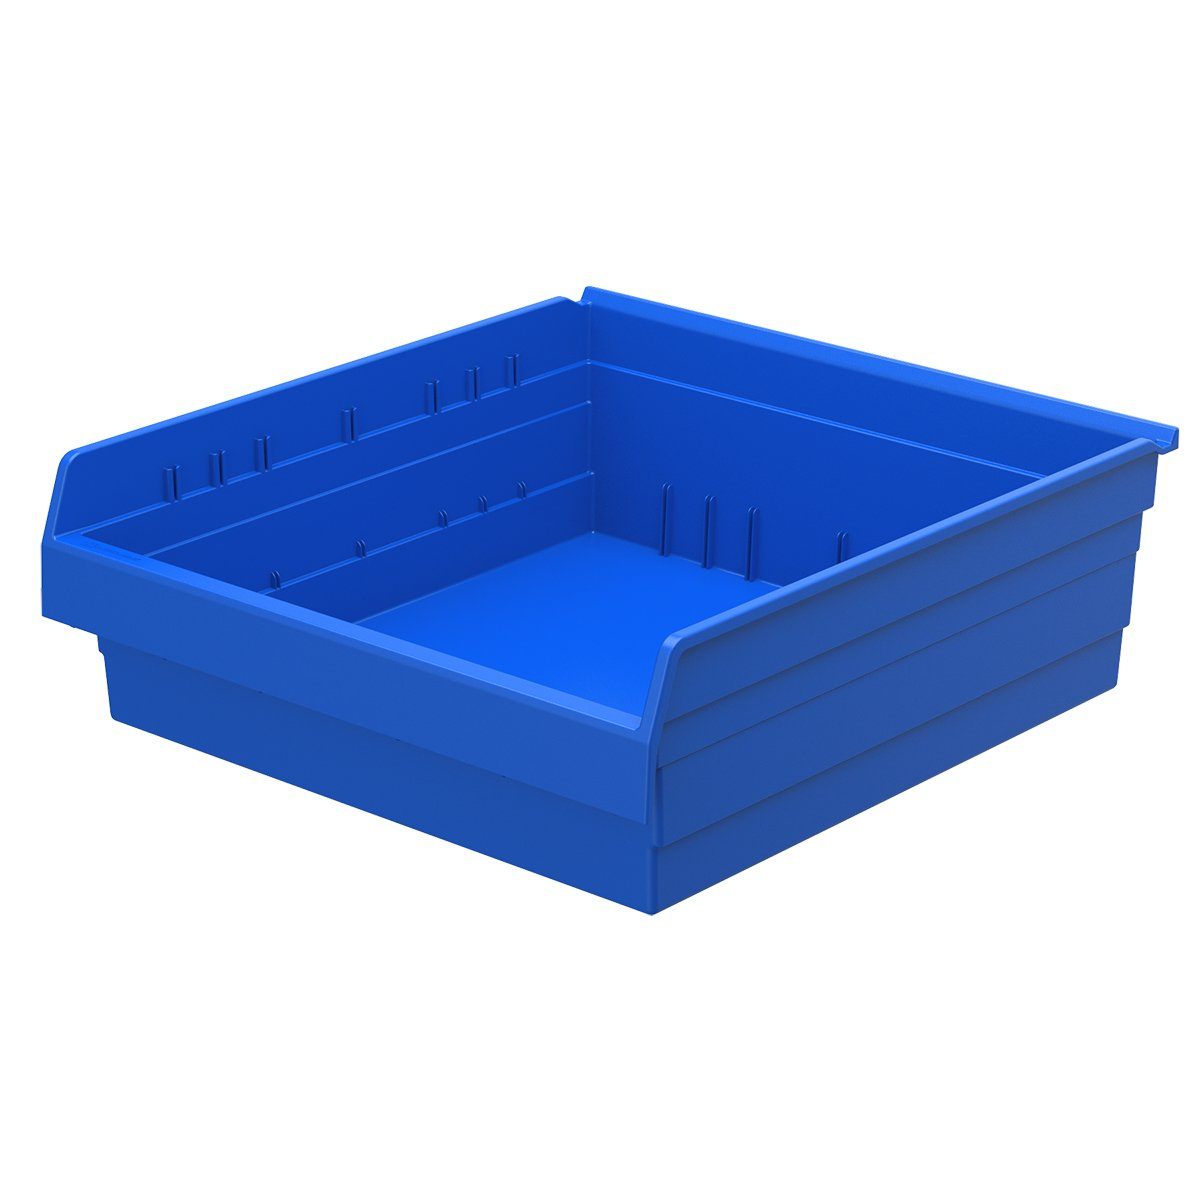 Akro-Mils 30824 ShelfMax 8 Plastic Nesting Shelf Bin Box, 24-Inch x 22-Inch x 8-Inch, Blue, 4-Pack